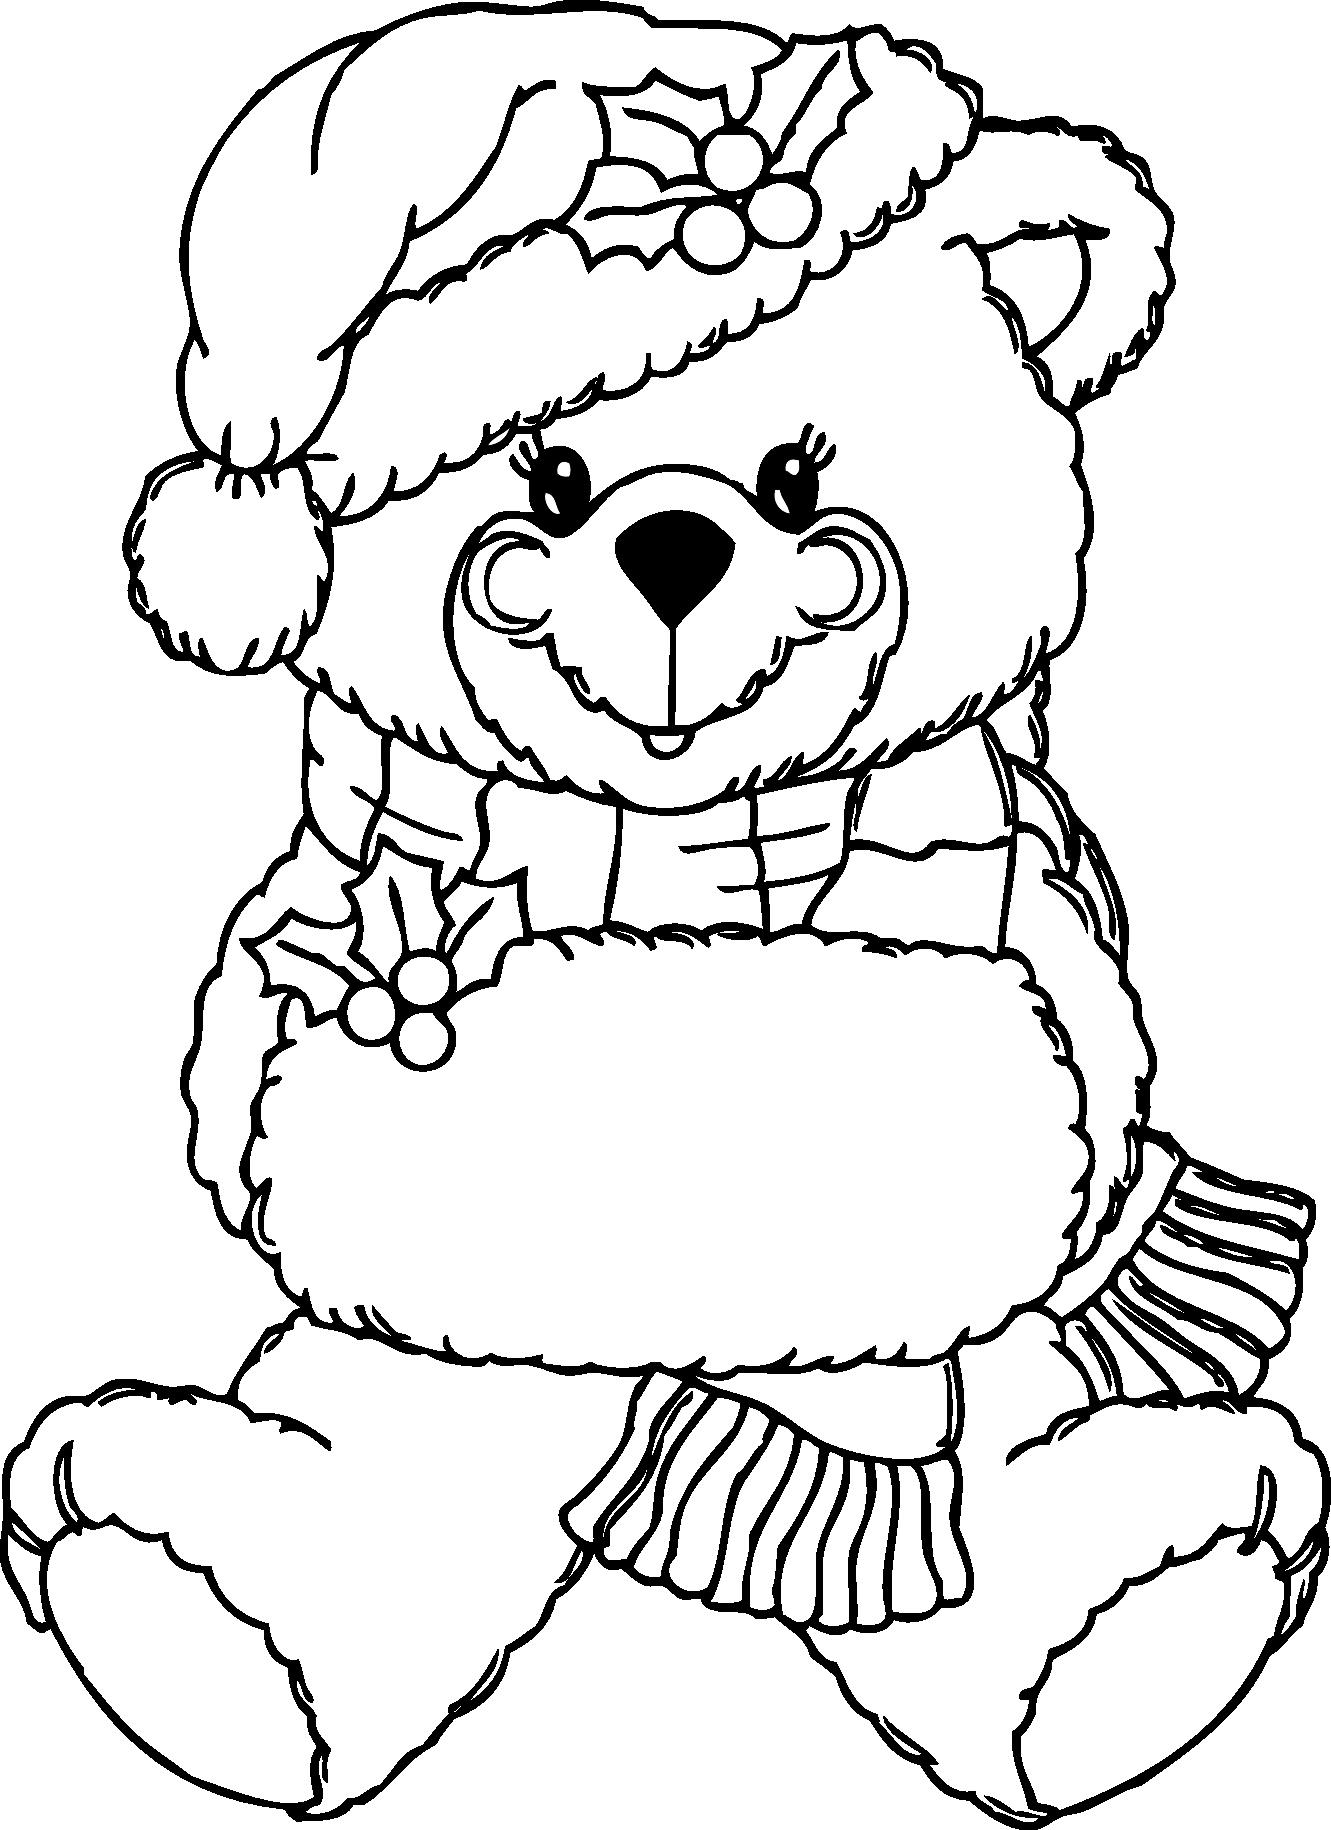 Christmas eve clipart black and white svg transparent library Christmas Teddy Bear Clip Art (43+) svg transparent library